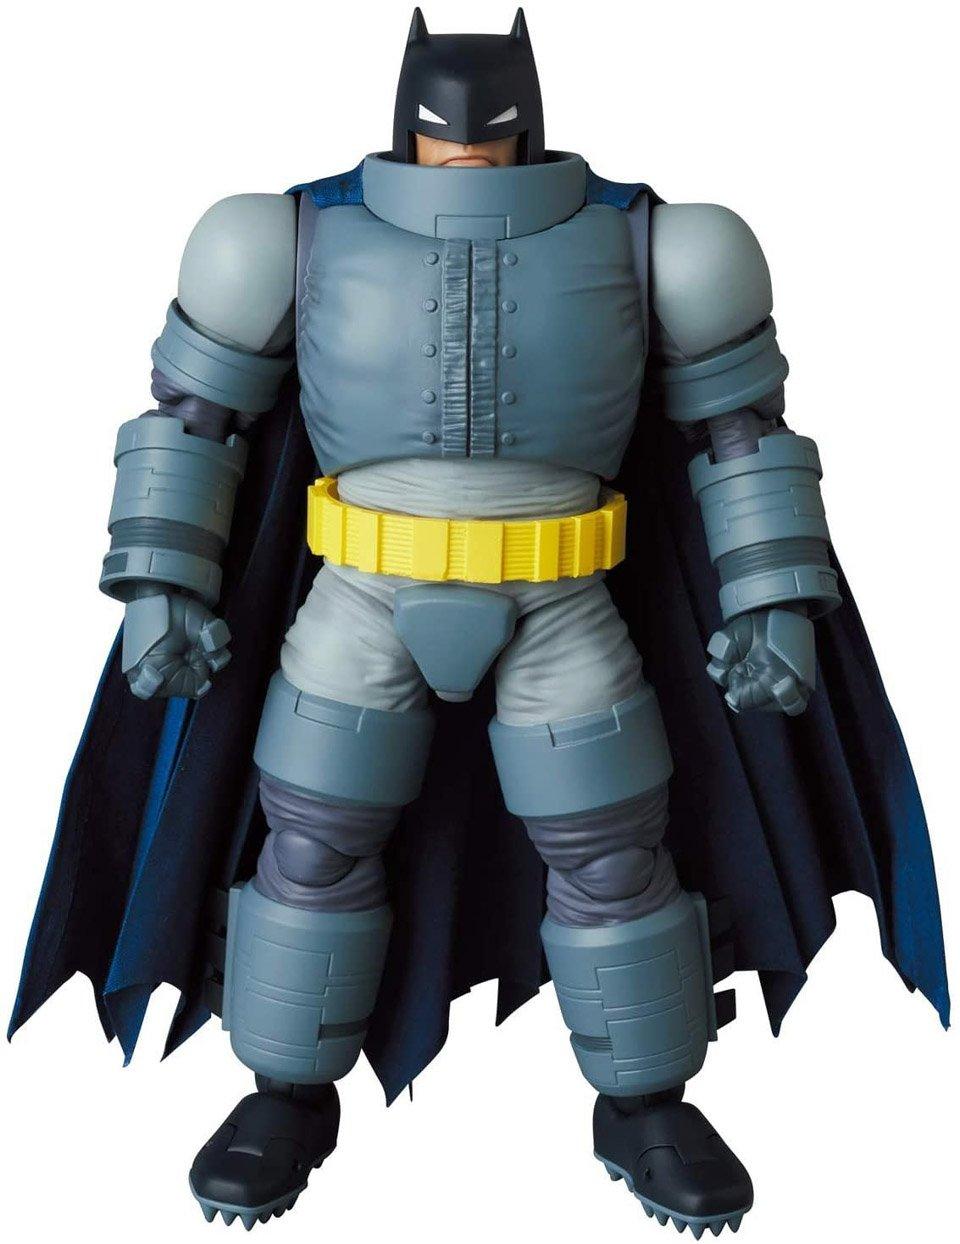 MAFEX Armored Batman Figure